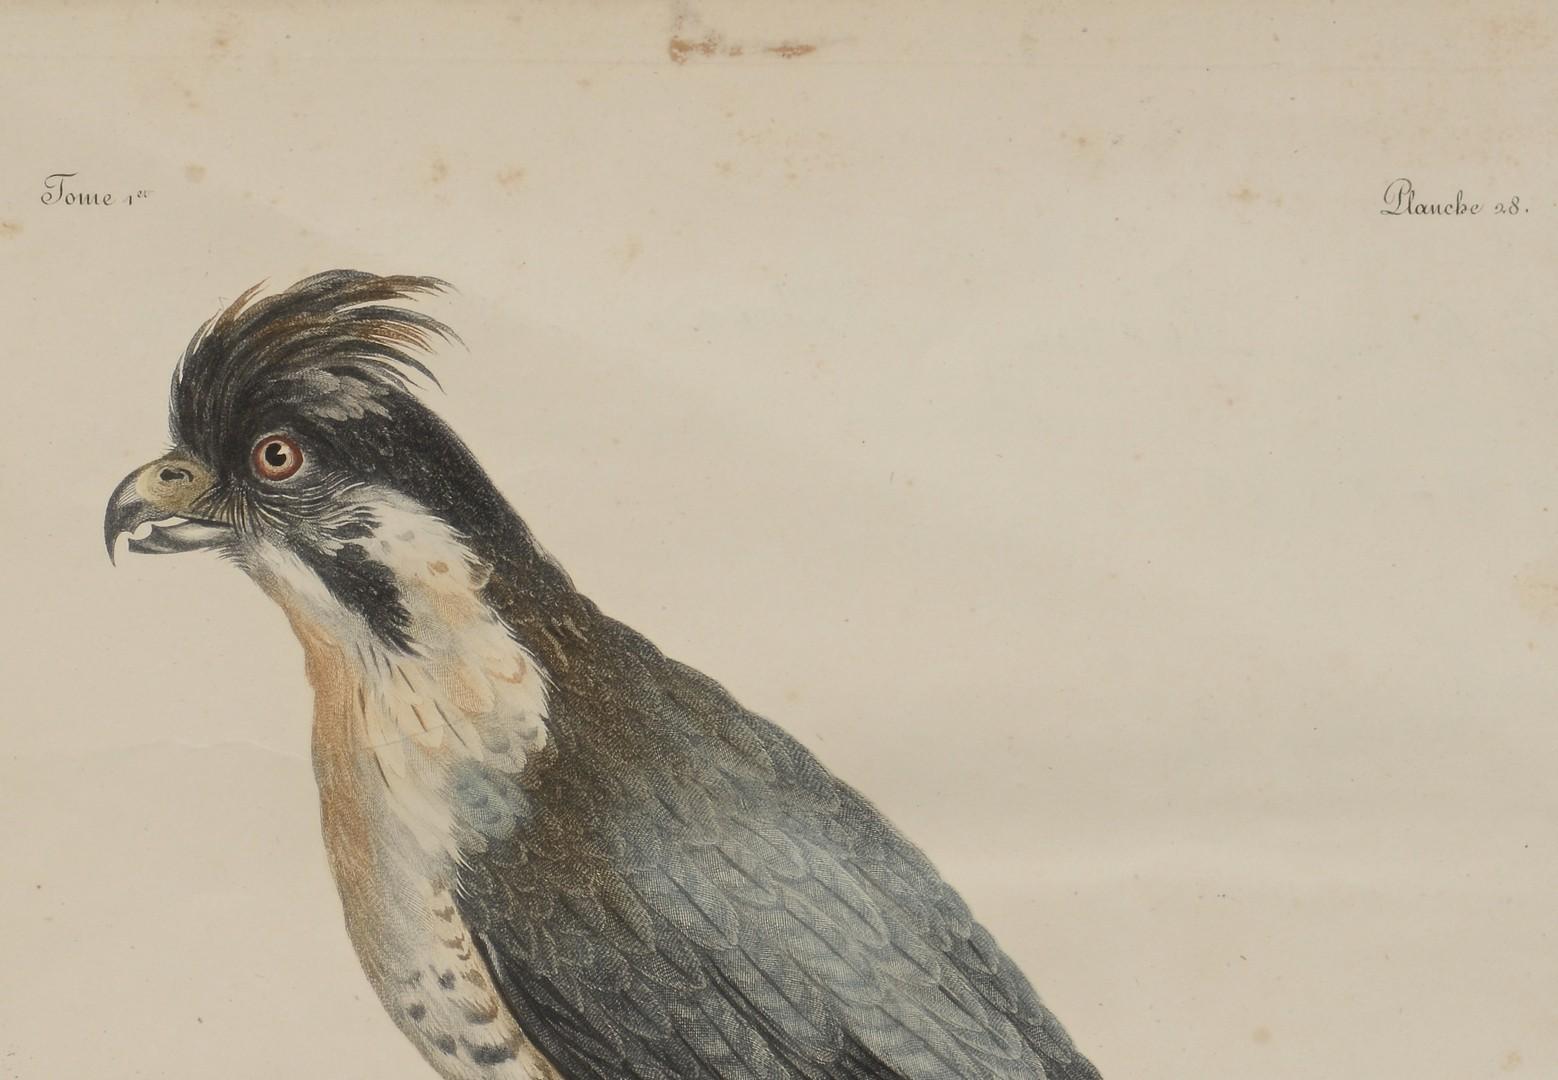 Lot 798: Pr C. Fessard Bird Engravings